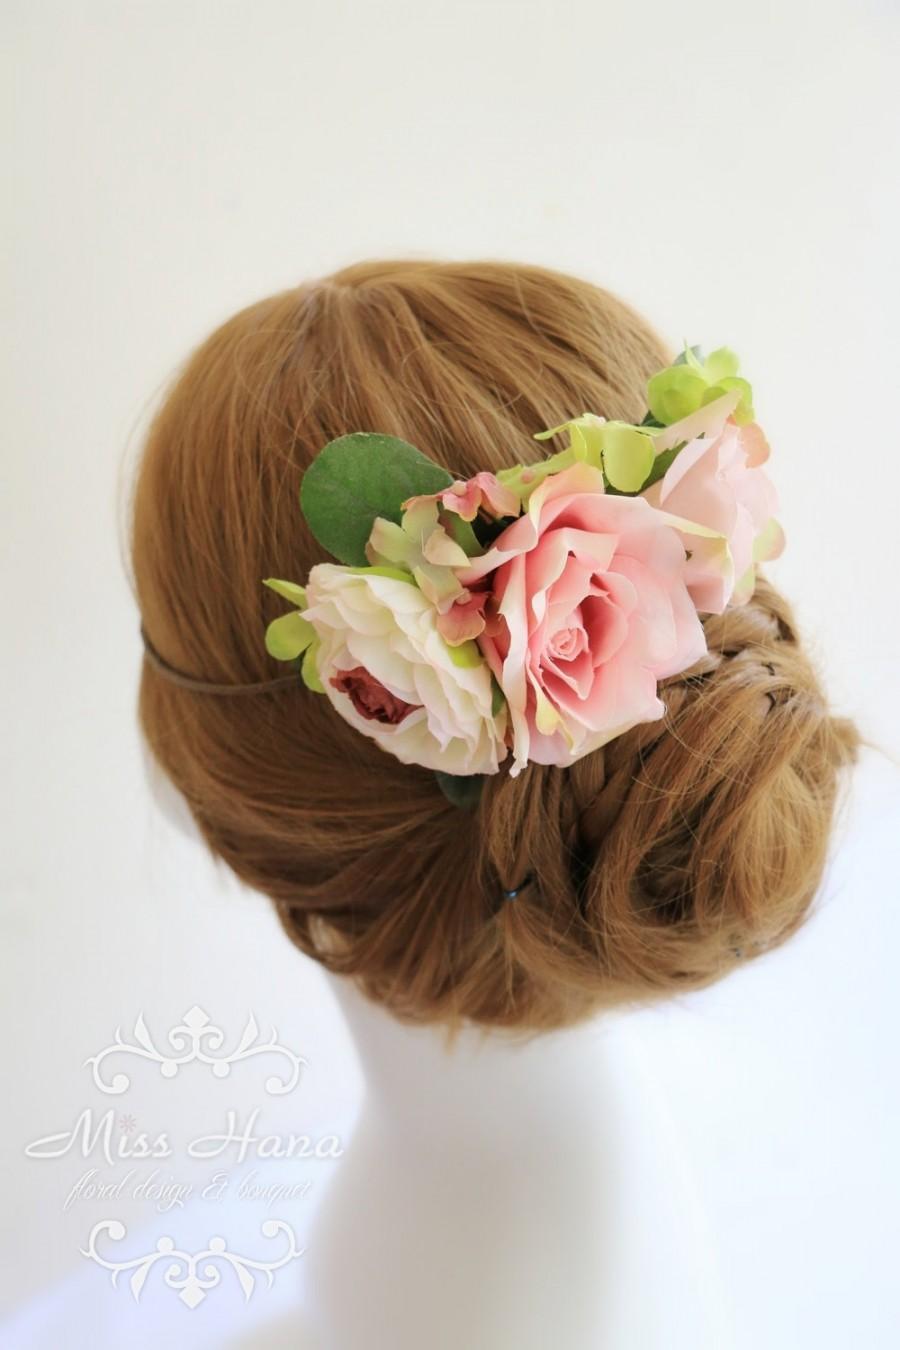 Mariage - Bridal Hair crown, Bridal hair accessory, Bridal hairpiece blush flower, Bride wreath, Bridesmaid Rustic Vintage outdoor wedding woodland